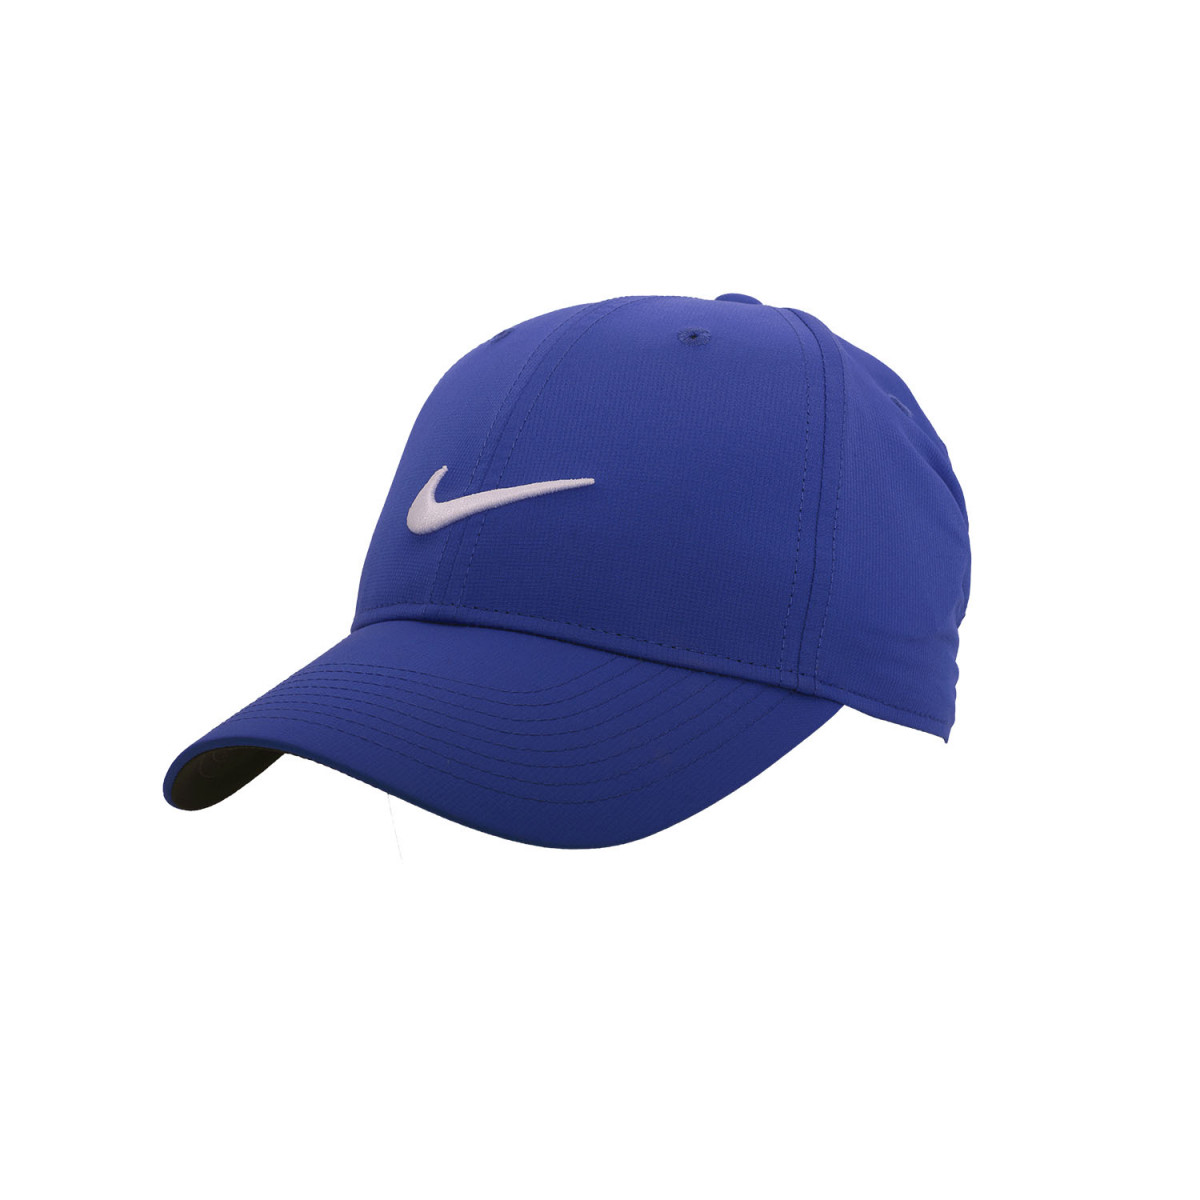 Gorra Nike Legacy 91 - Caps - Gorros - Accesorios - Mujer cb0830d24af